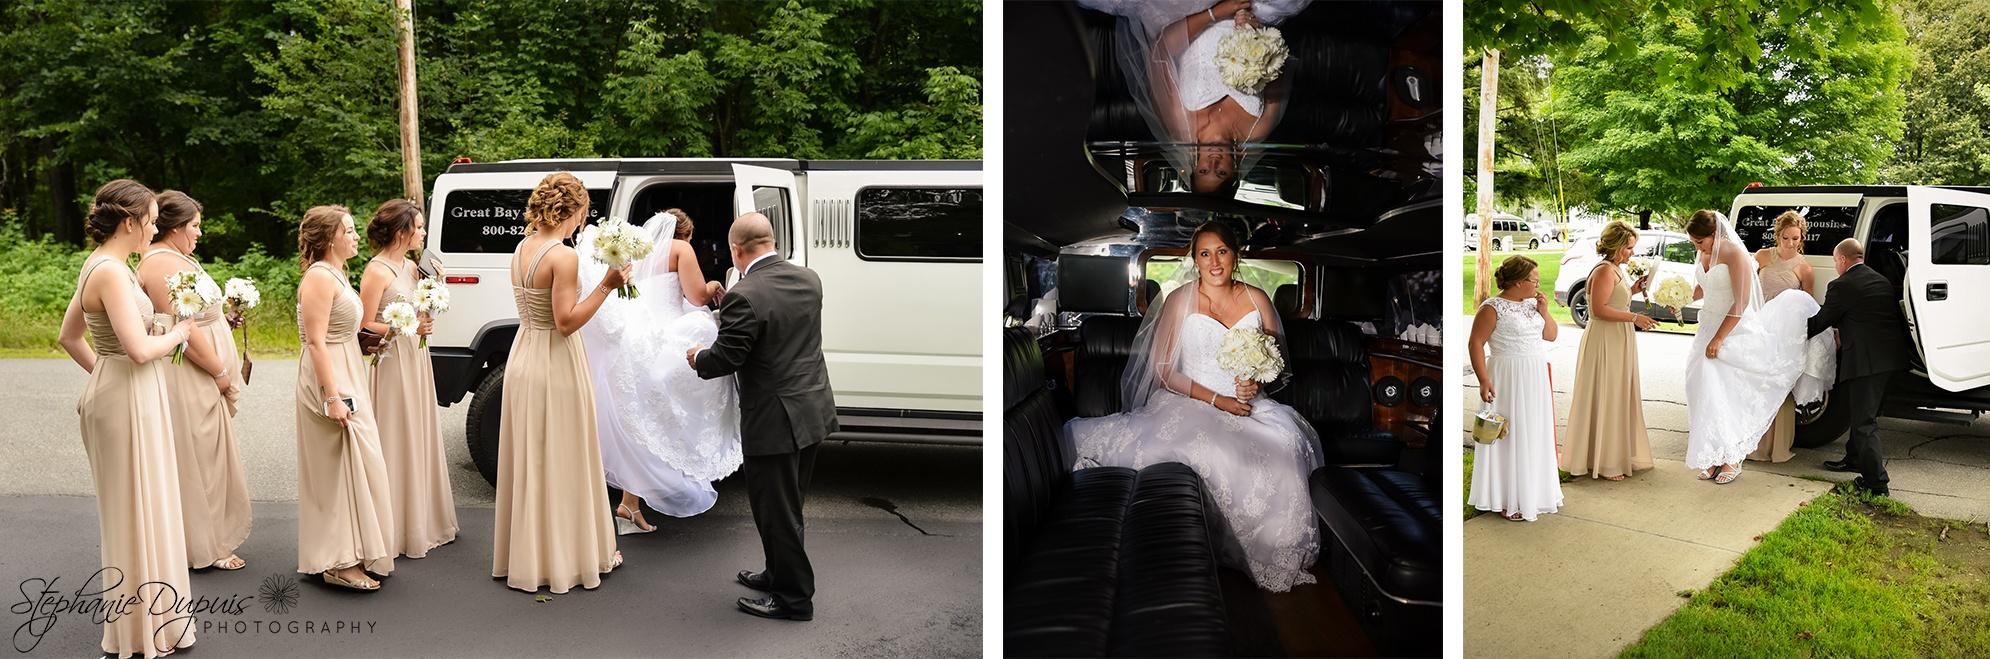 Littleton Wedding Photographer 01 4 - Portfolio: Nason Wedding